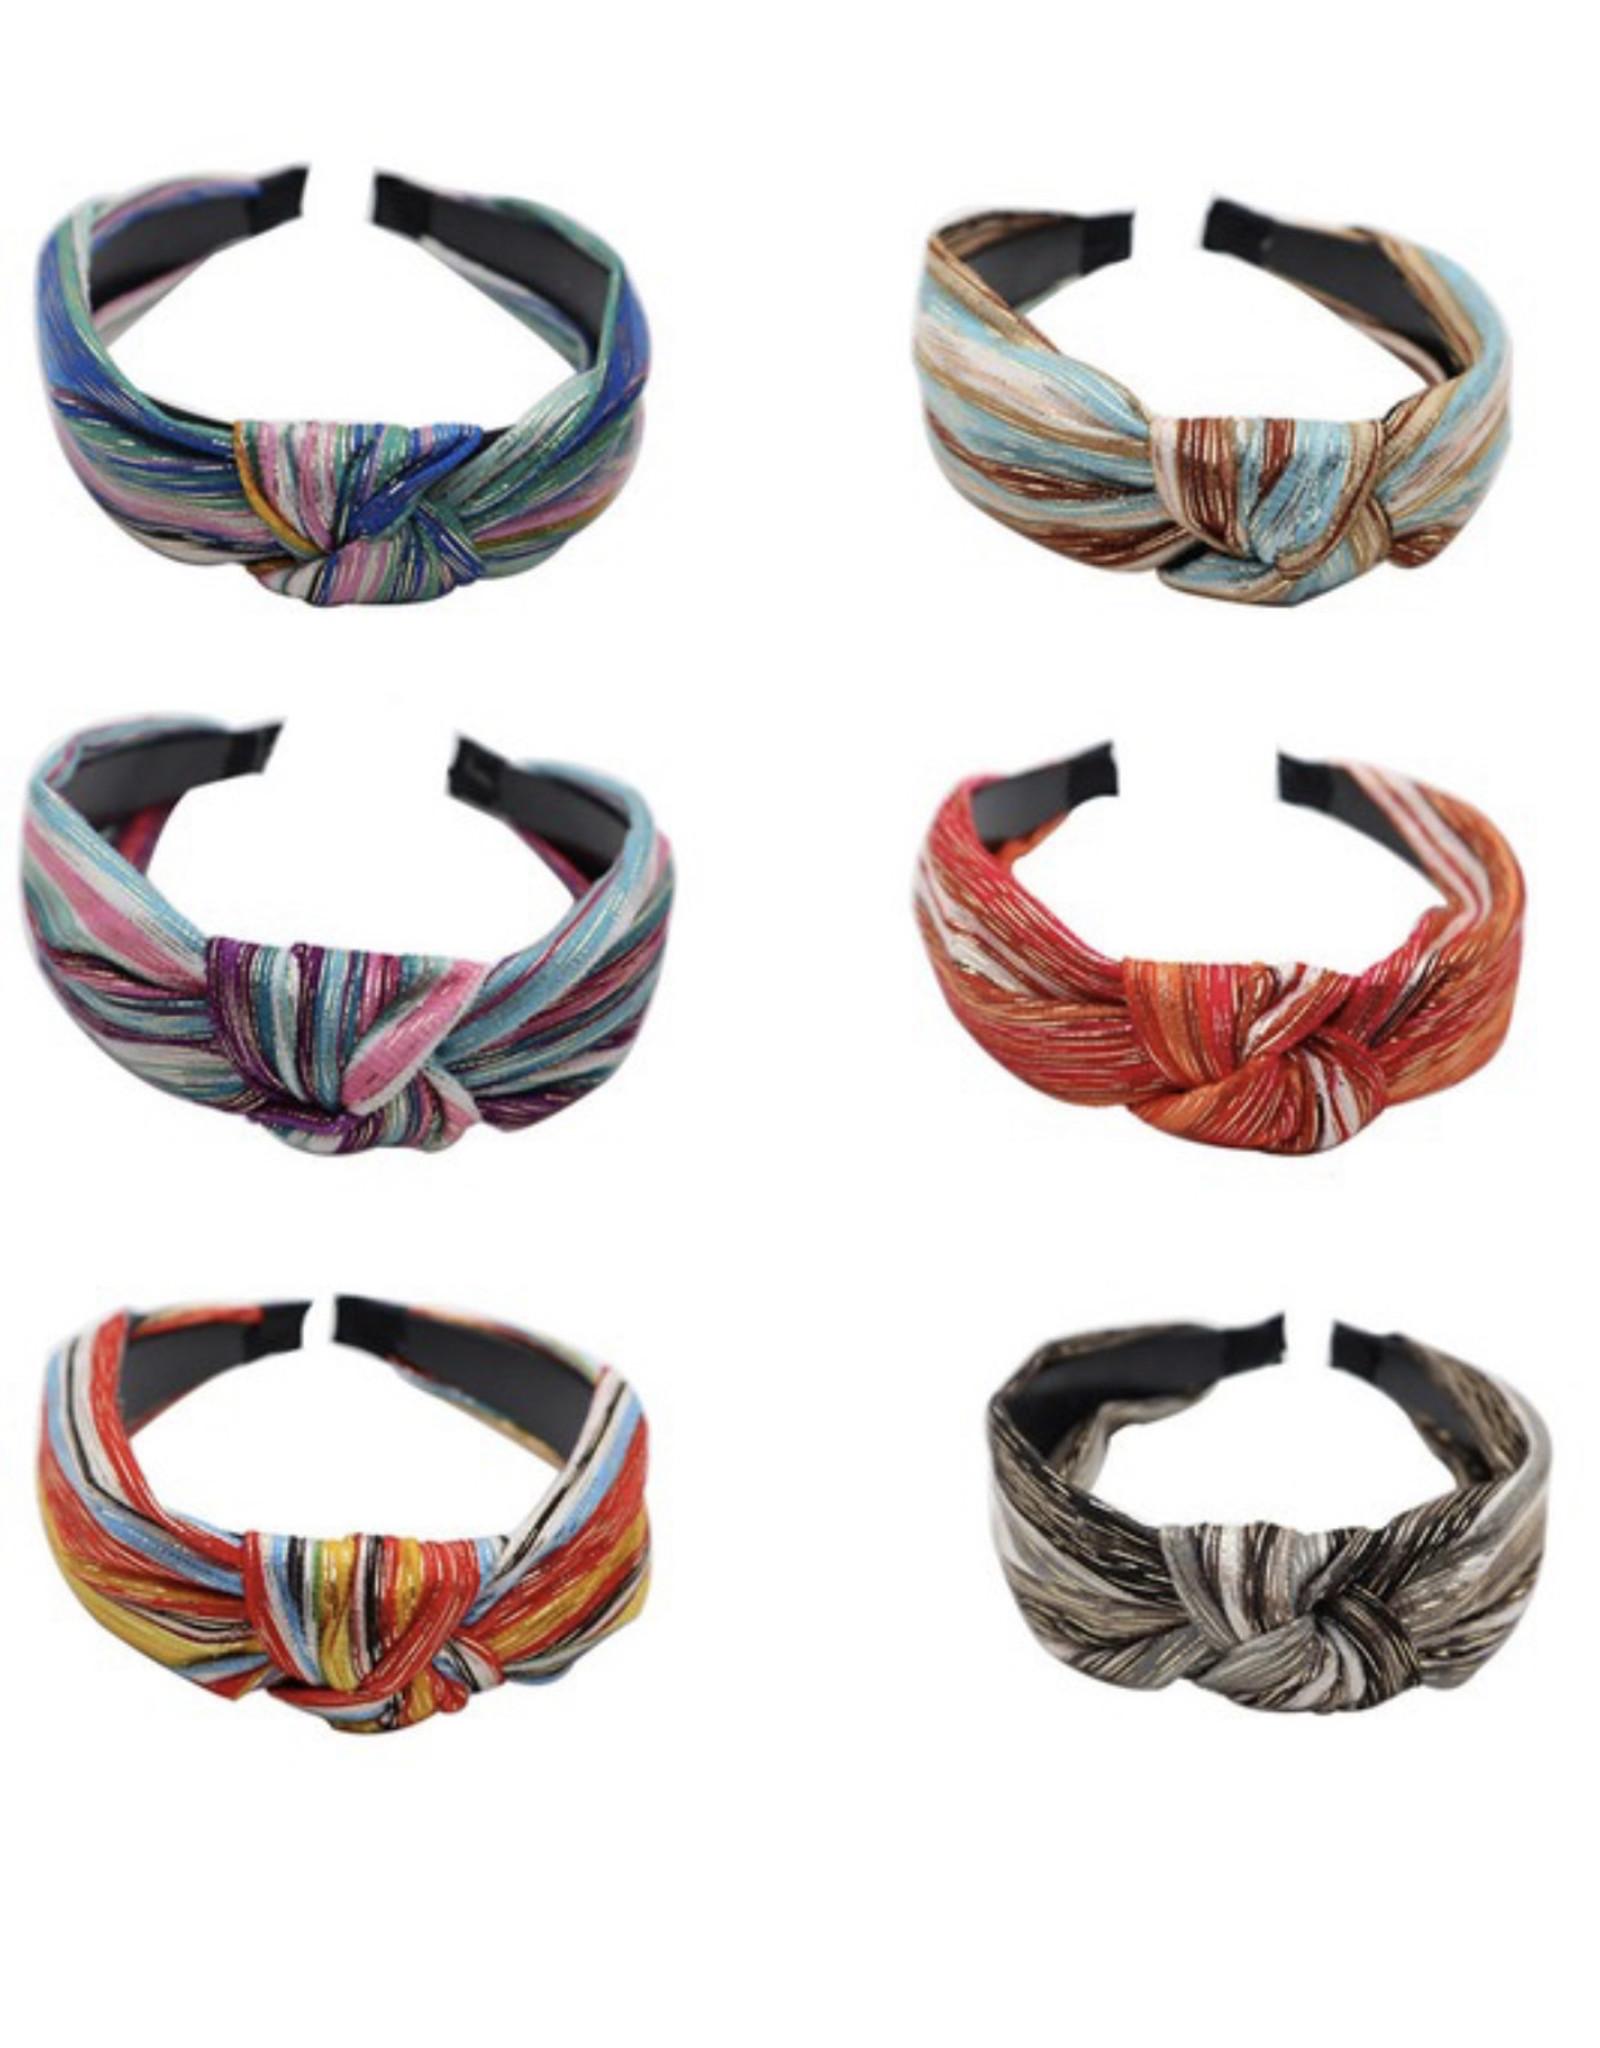 Funteze Accessories CASEY Knotted Headband